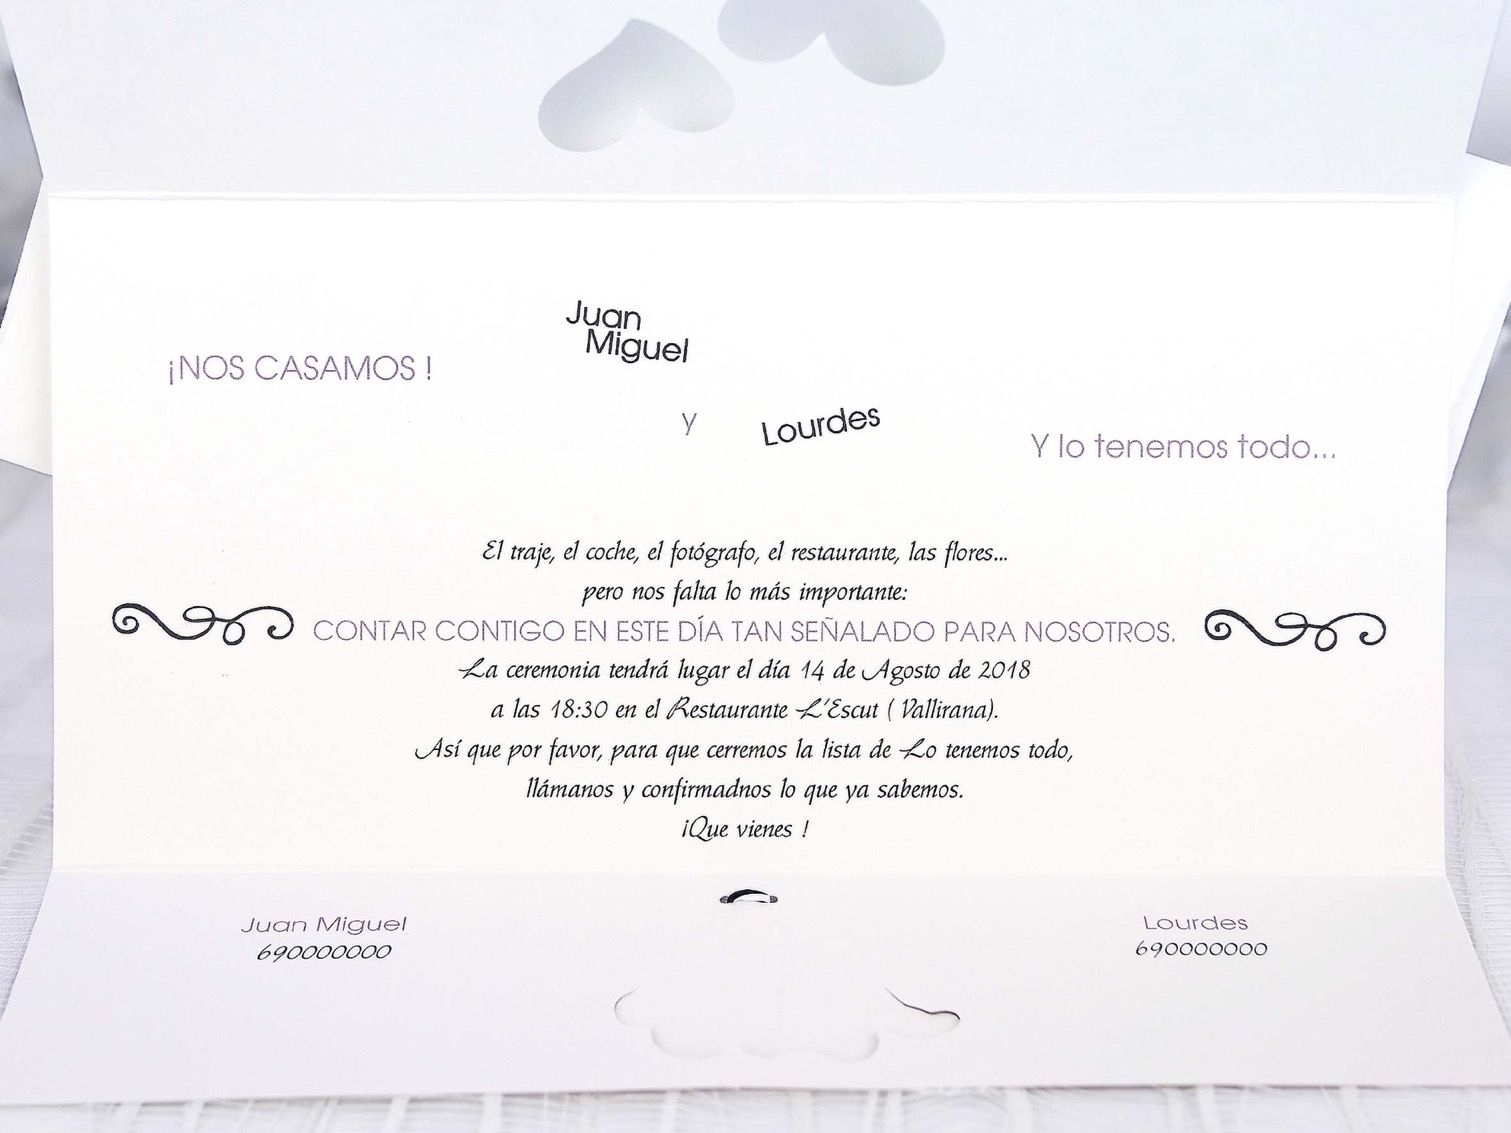 Invitaciones de boda coleccion emma 2020-2021 imprenta dimension print teruel-160